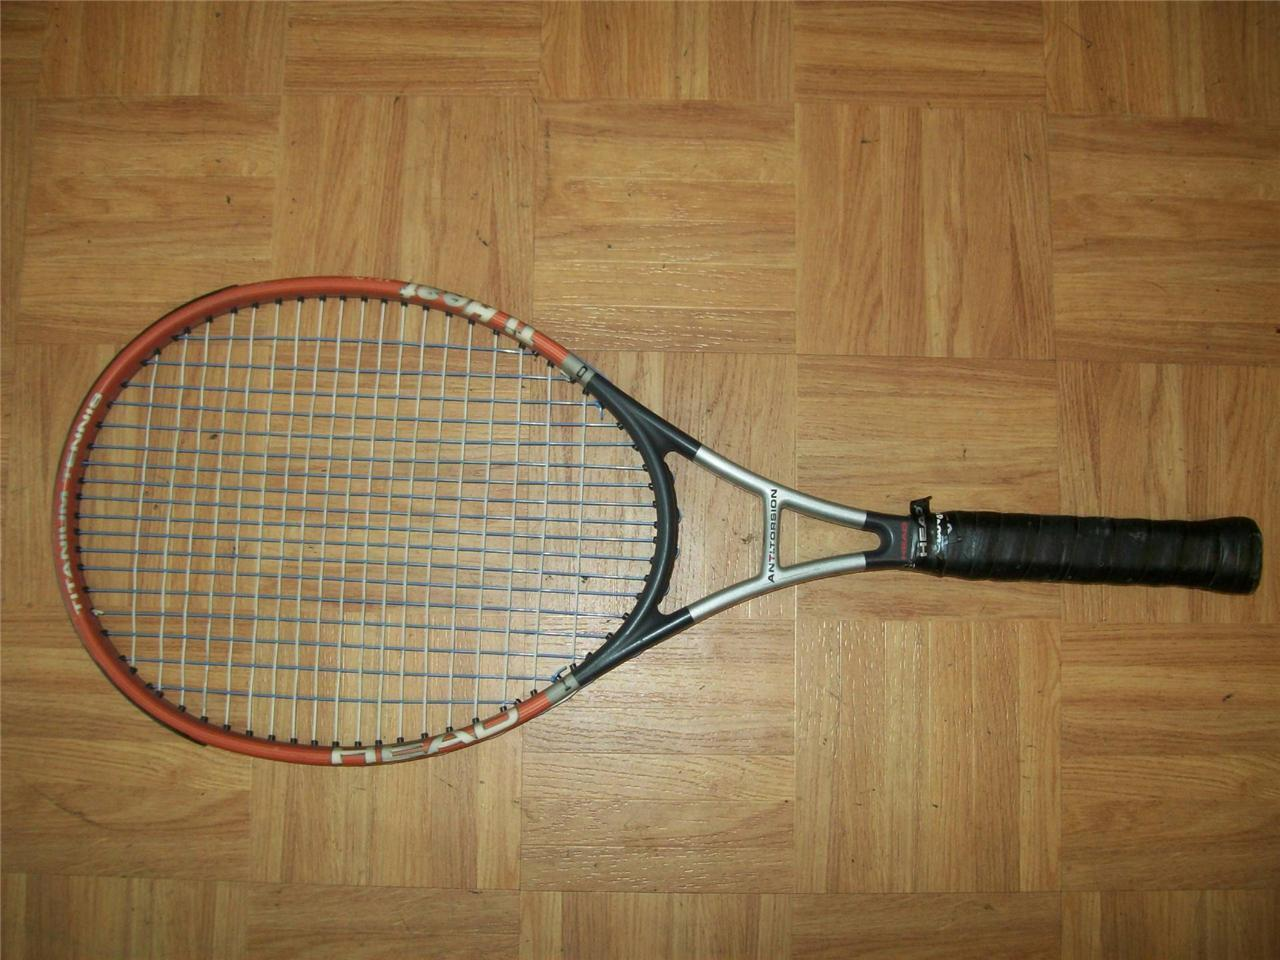 Head Ti. Heat Midplus 102 head  4 5 8 grip Tennis Racquet